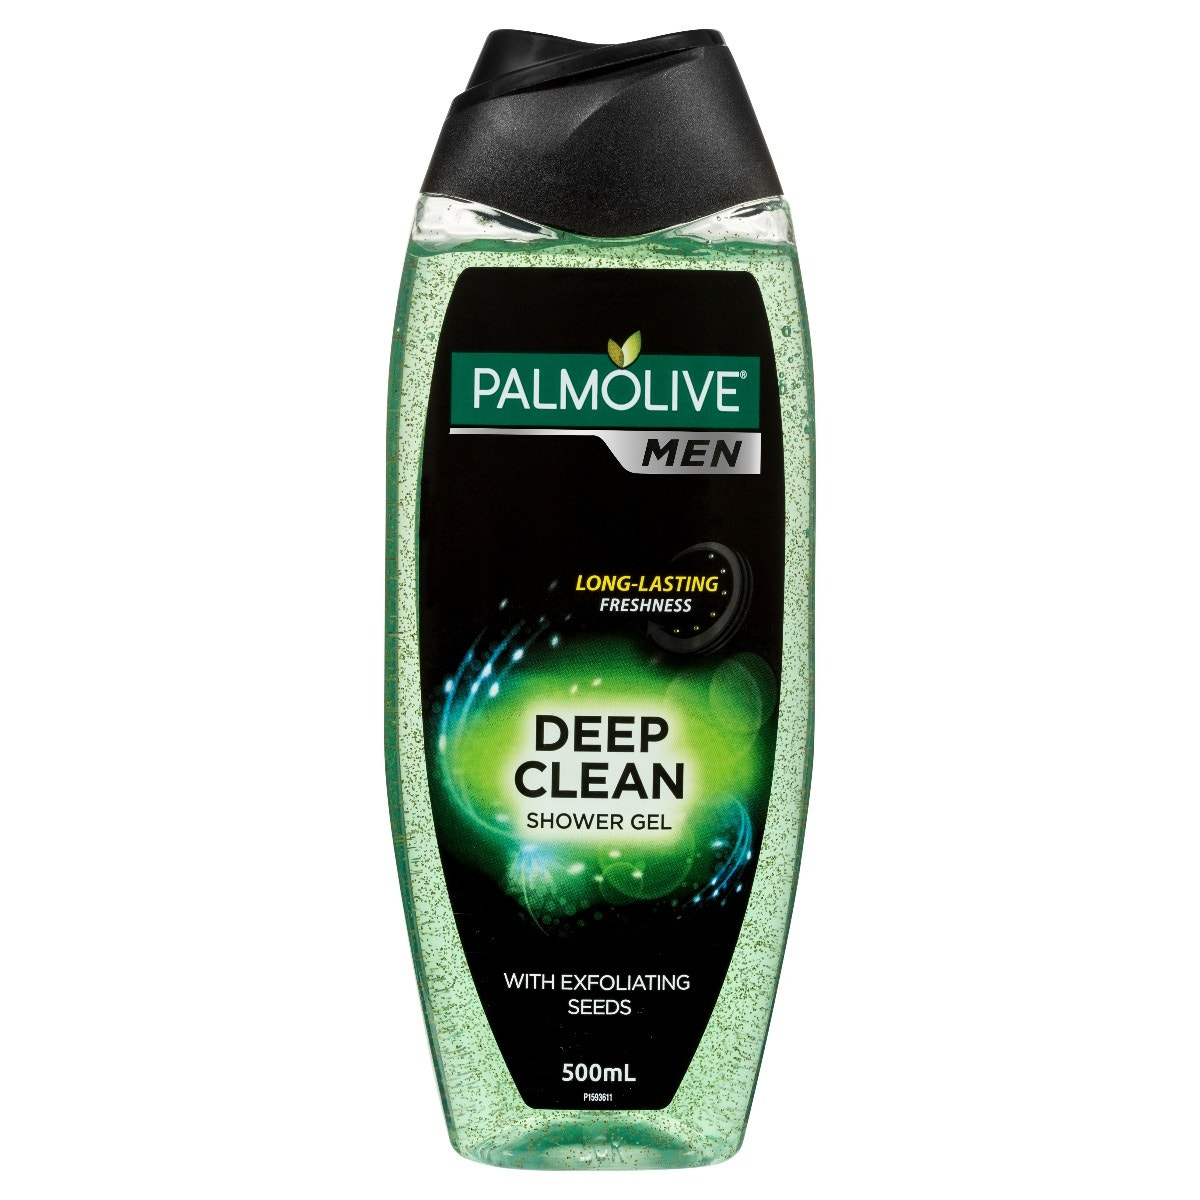 Shower Gel Chemist Direct Dettol Deep Cleanse Body Wash 400ml Pouch